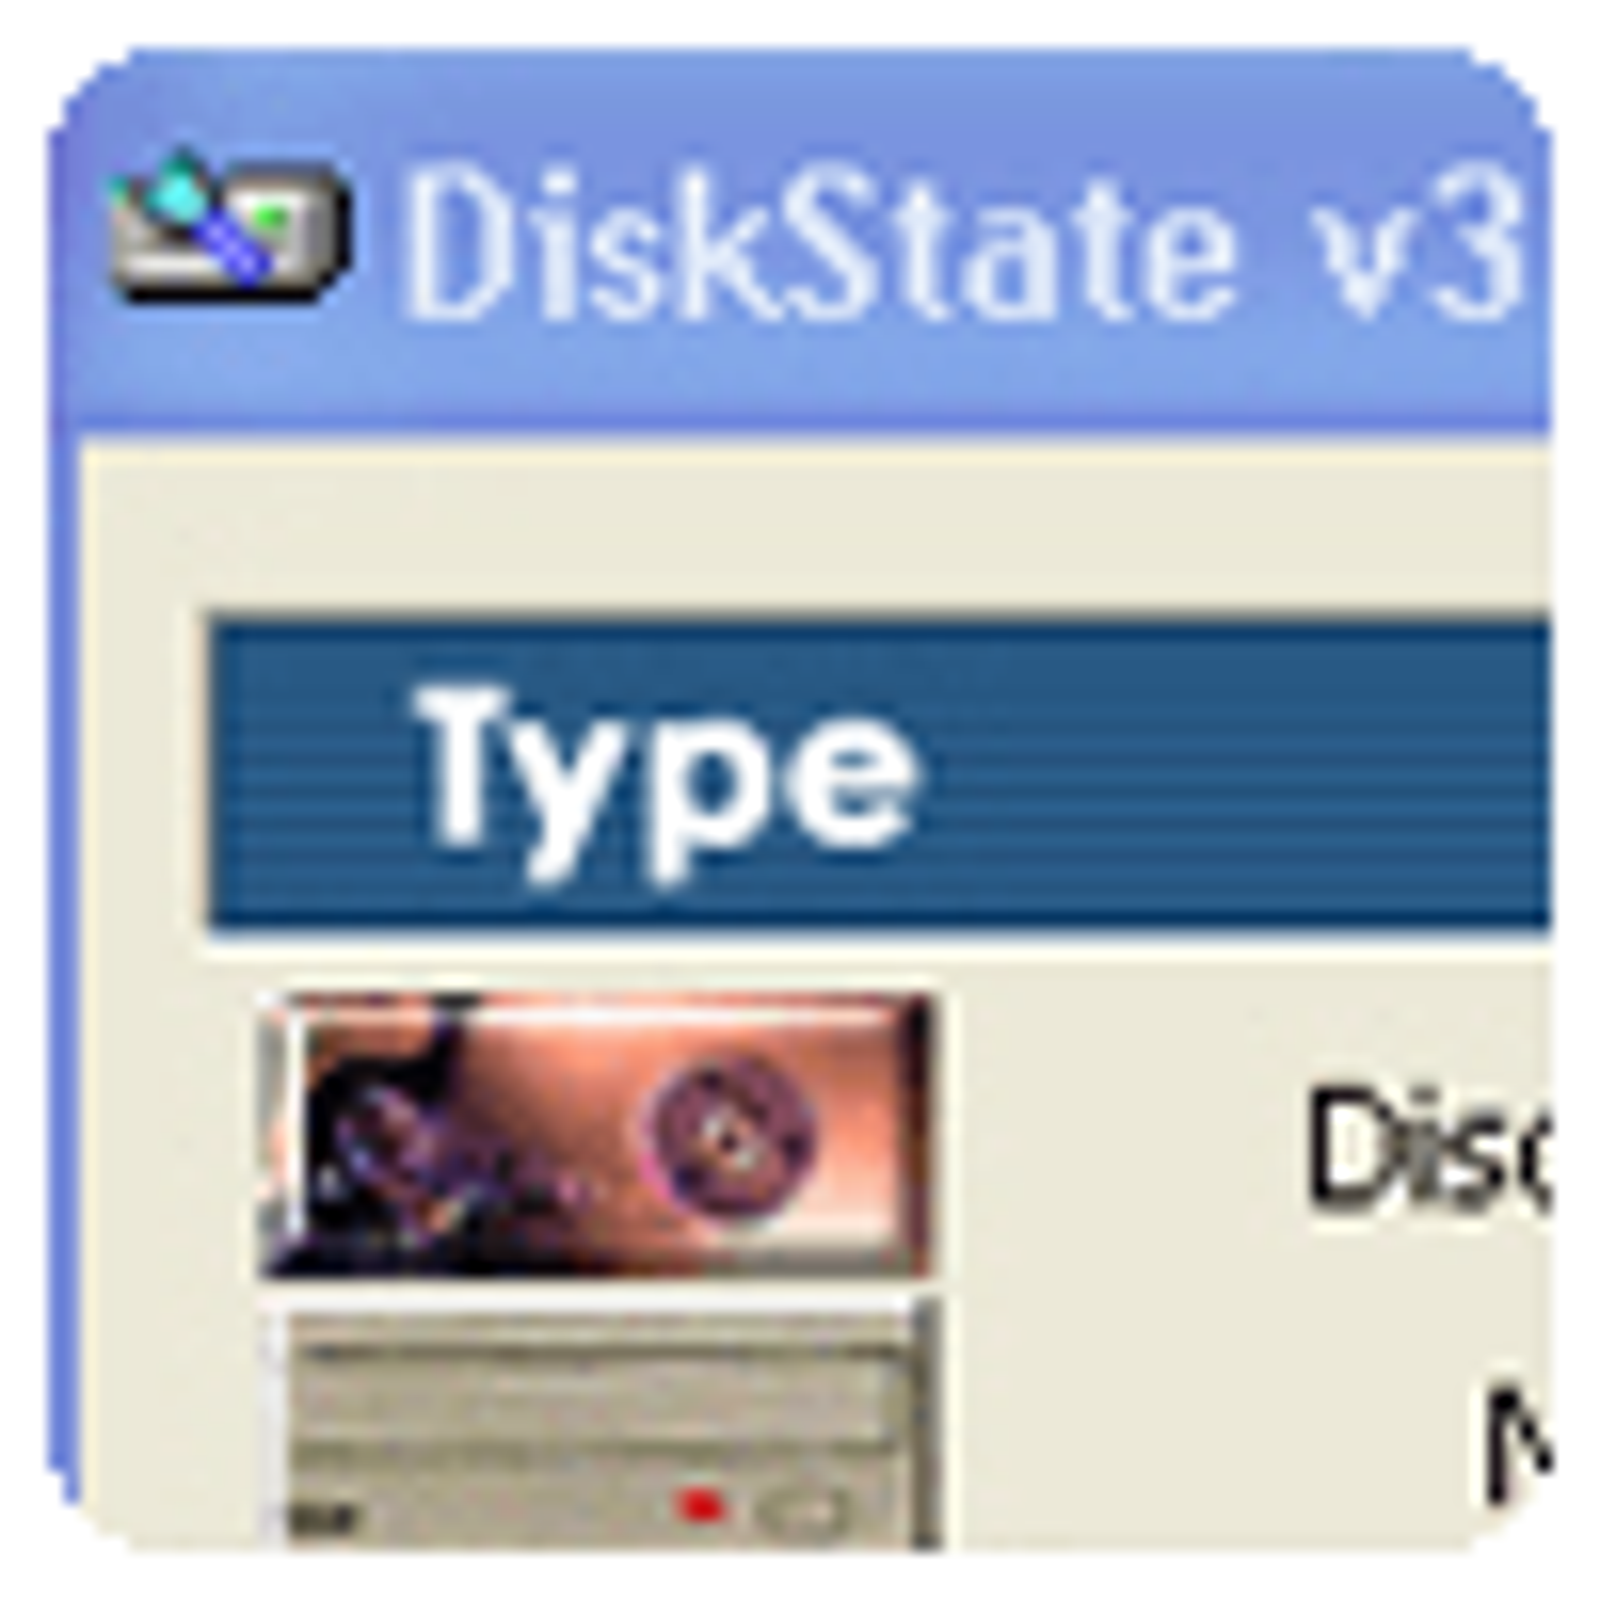 DiskState